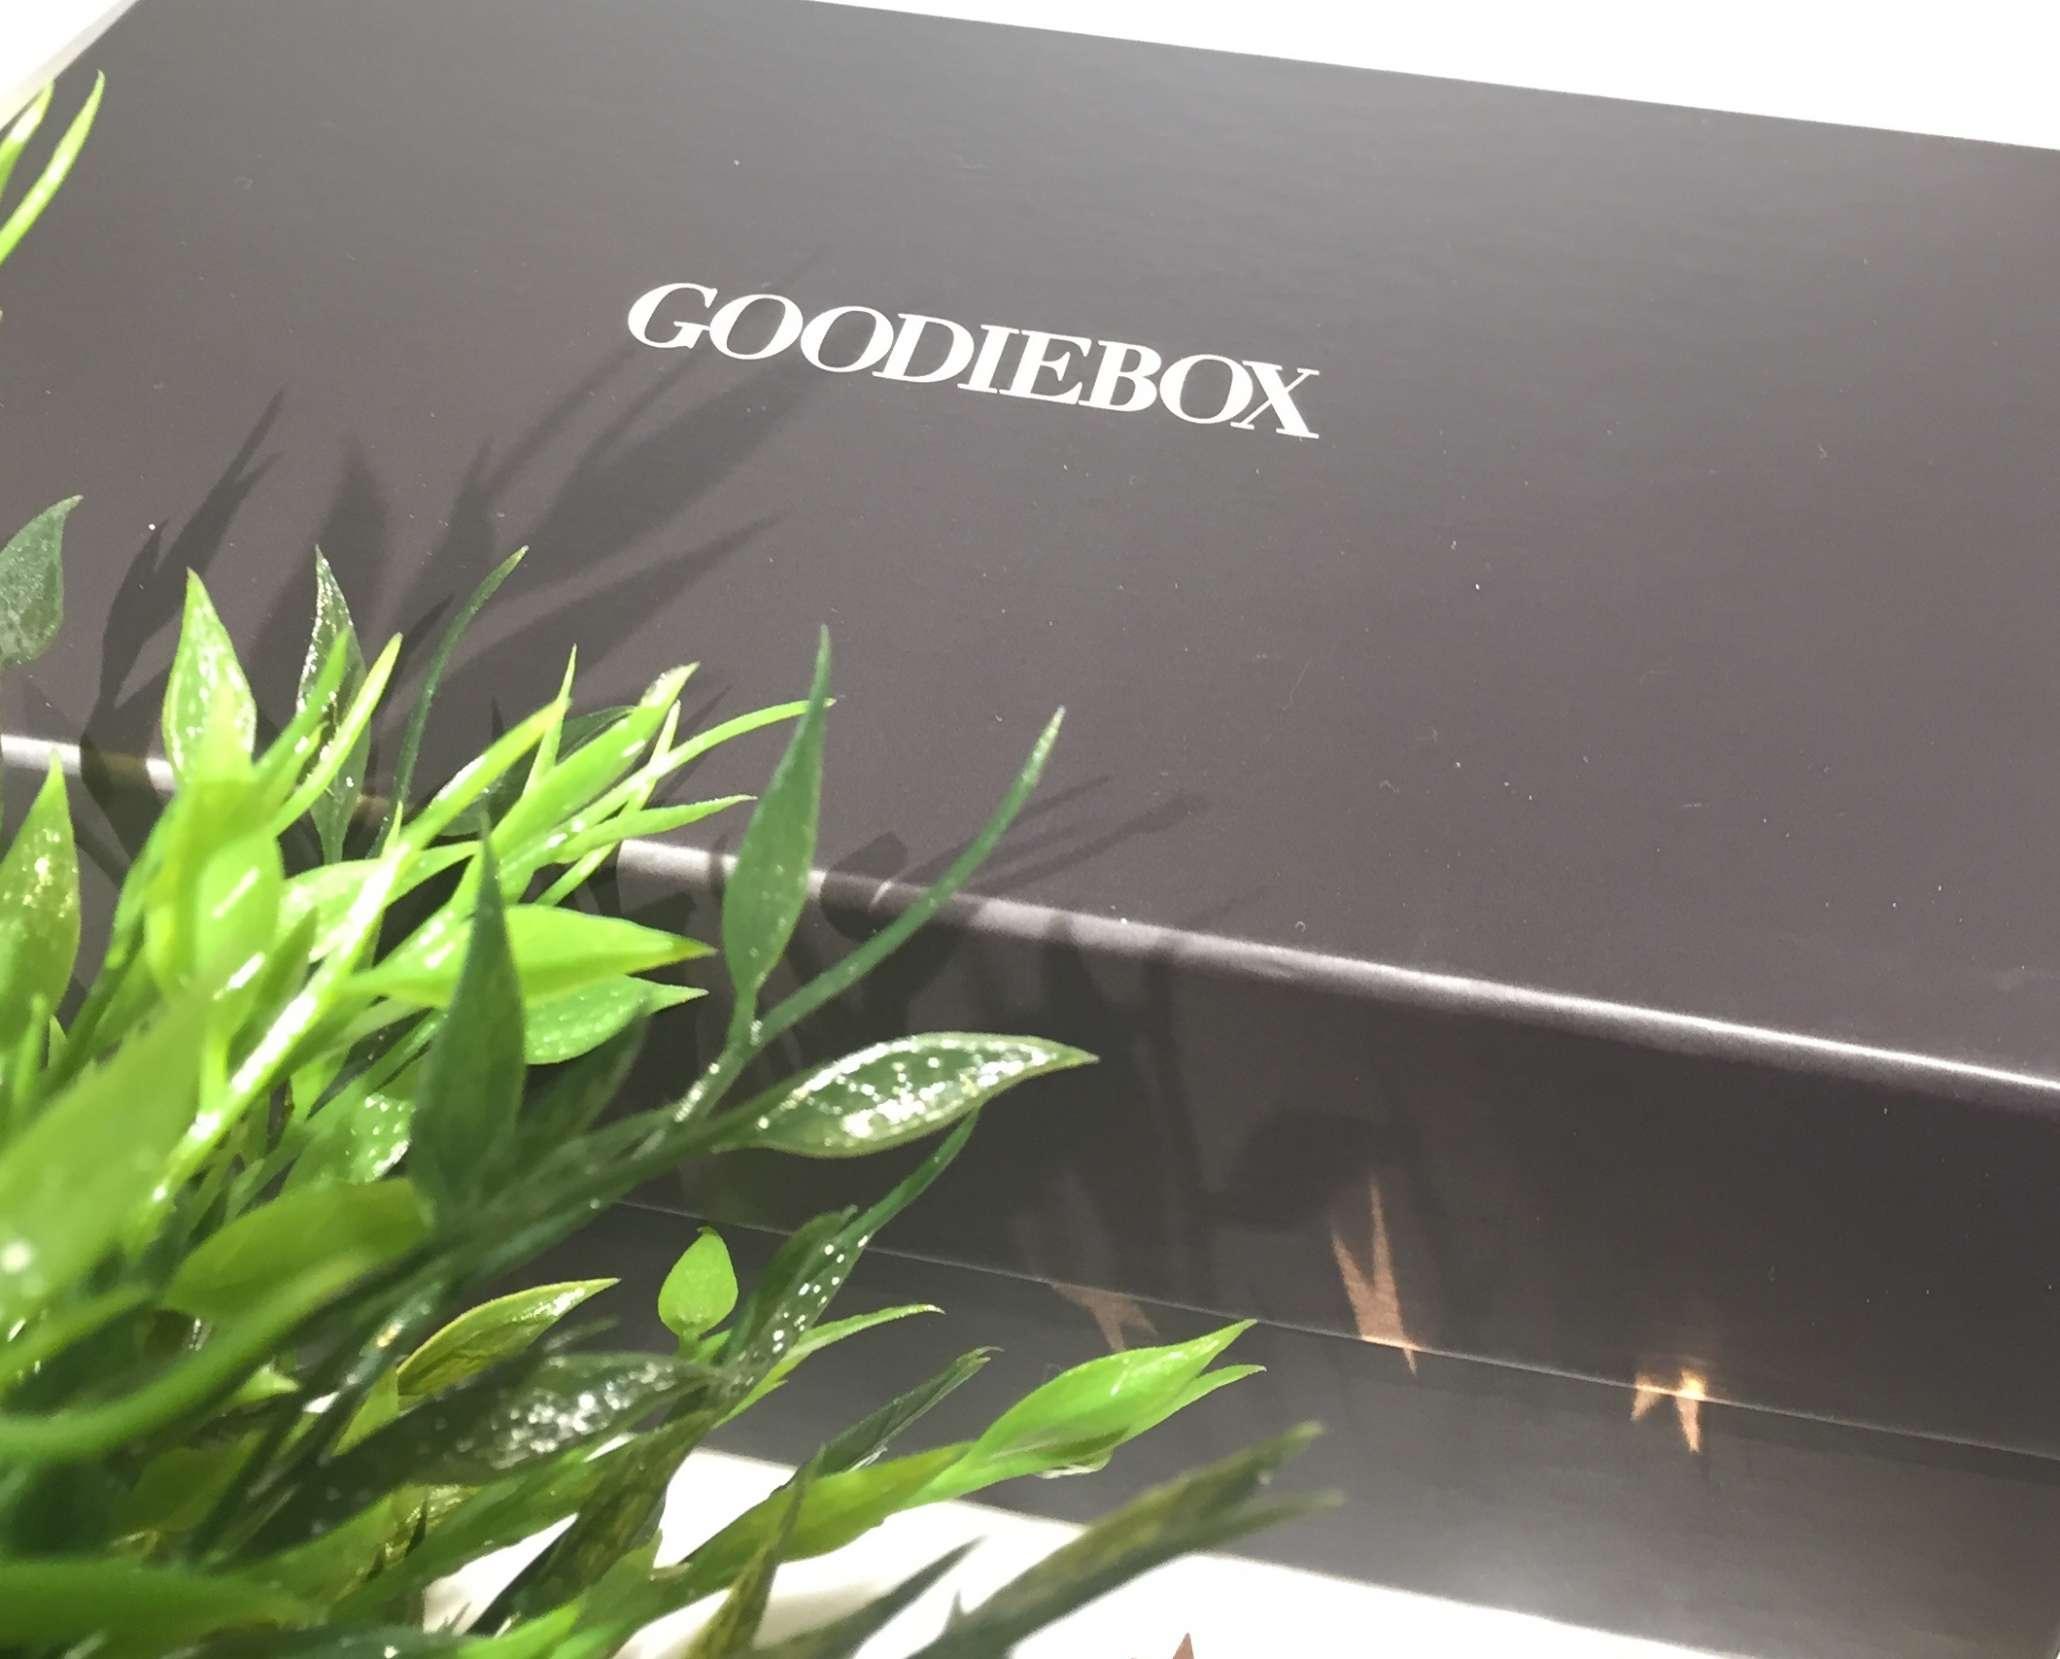 Goodiebox, Goodiebox Danmark, Iroha, Human + Kind, The Vintage Cosmetics Company, Balance Me, Ling, Iroha, Praha, Glasfil, Ansigtspleje, Håndmaske, Krummeskrummelurer, Goodiebox Oktober 2017